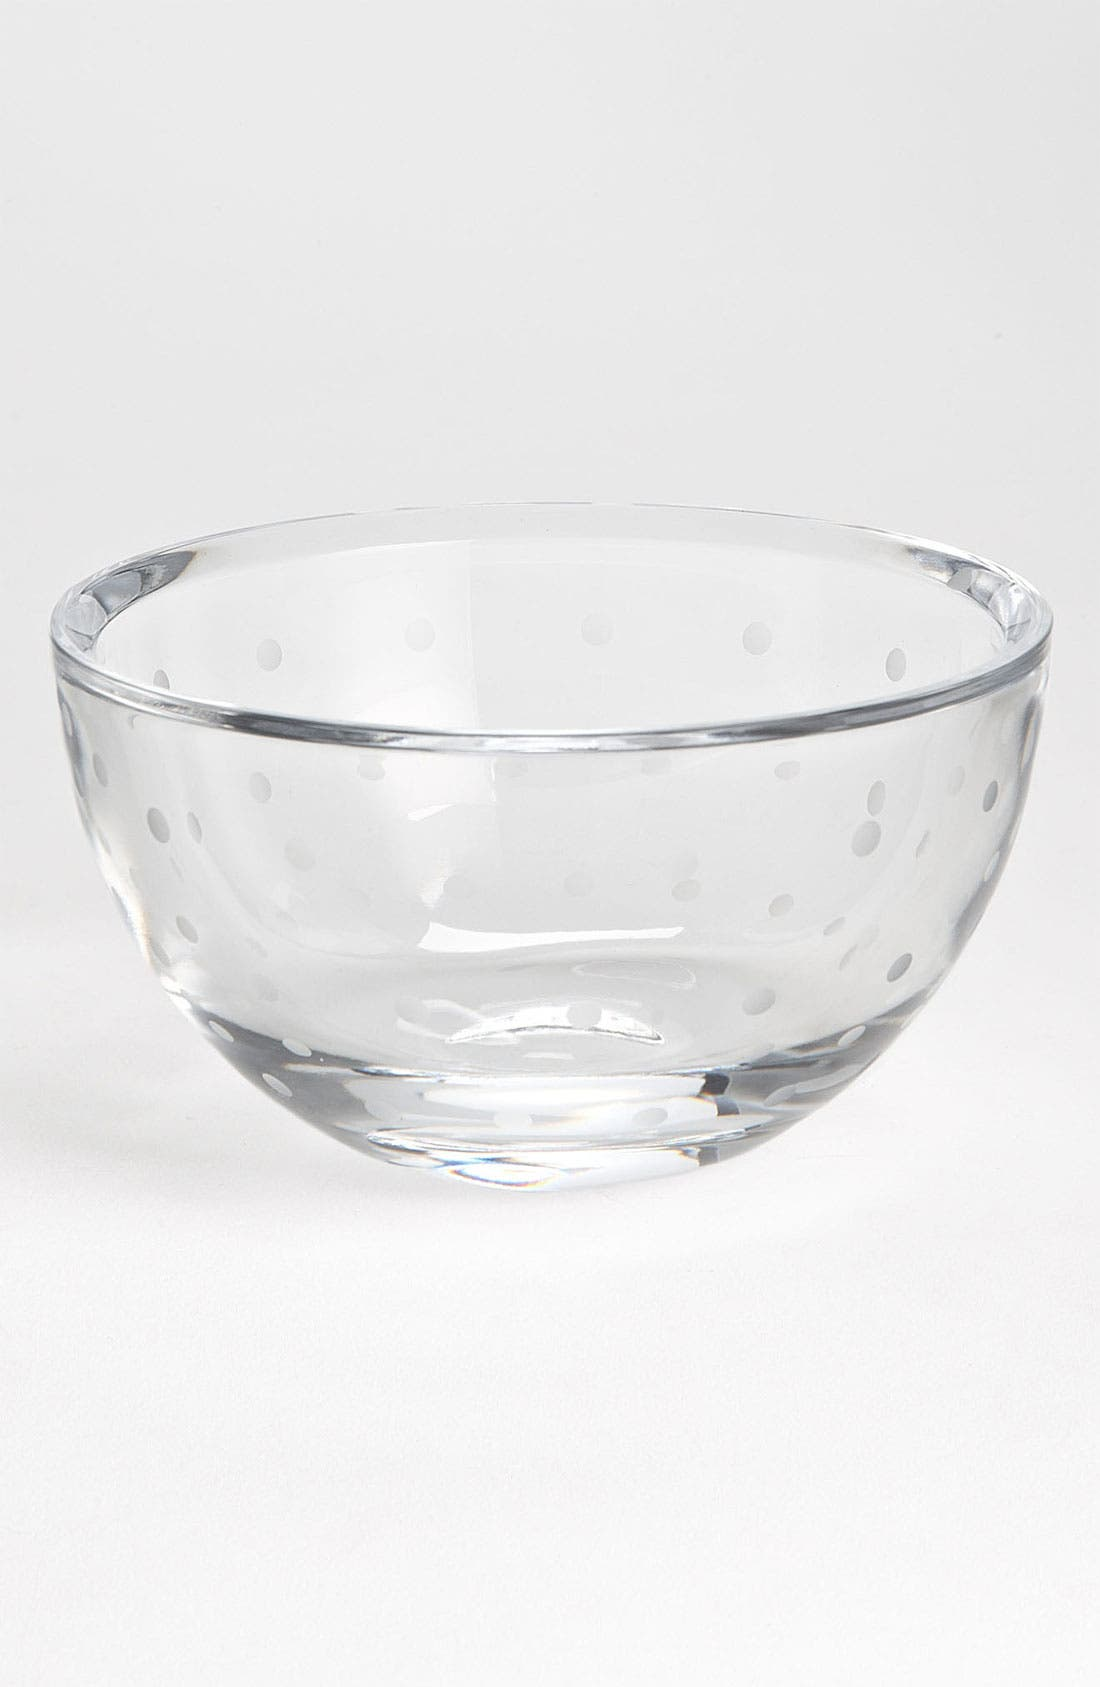 Main Image - kate spade new york 'larabee dot' round bowl